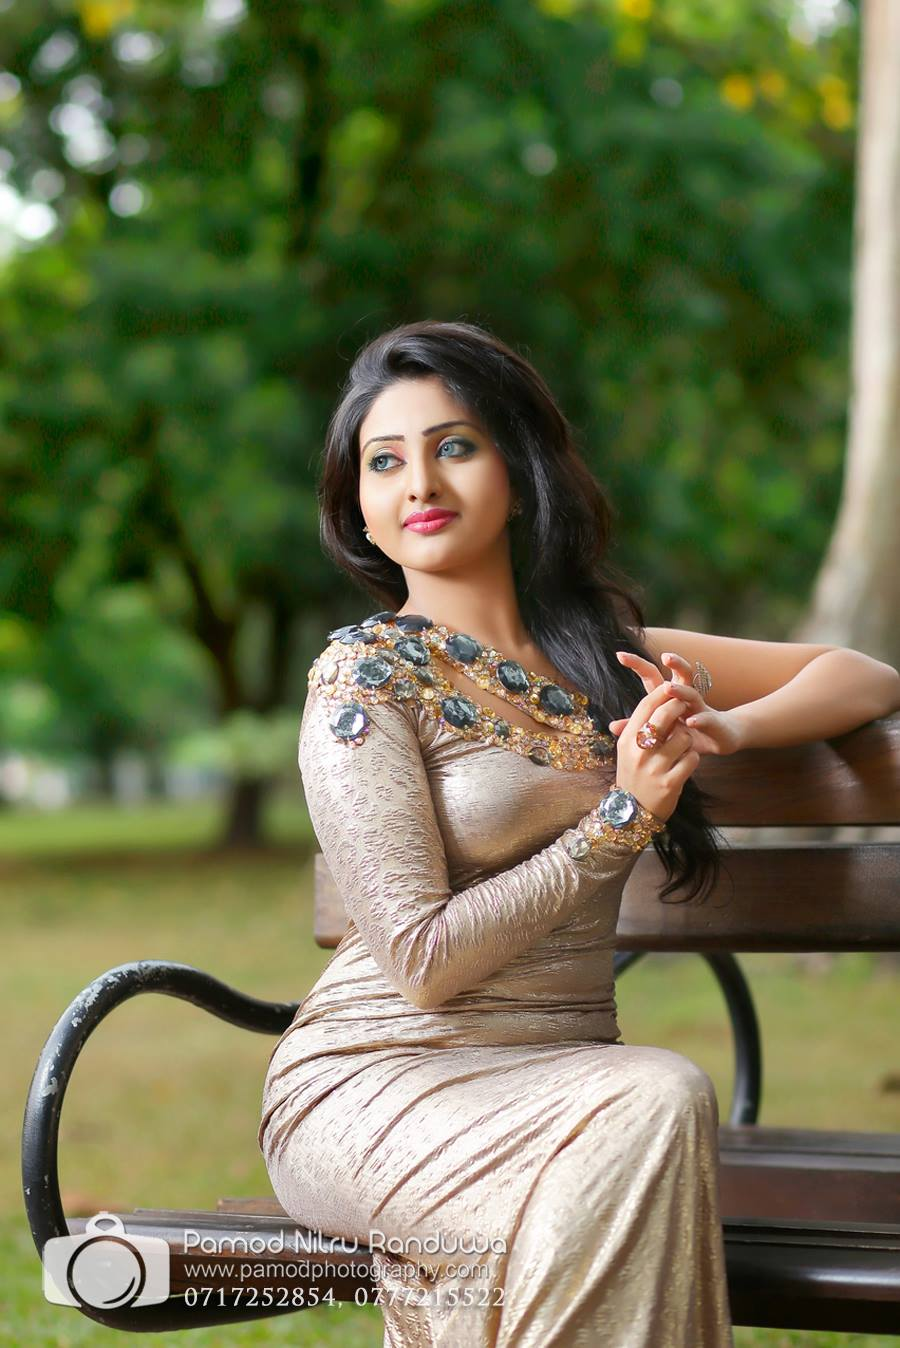 Sri Lankan Hot Girls: Sri Lankan Actress and model Vinu